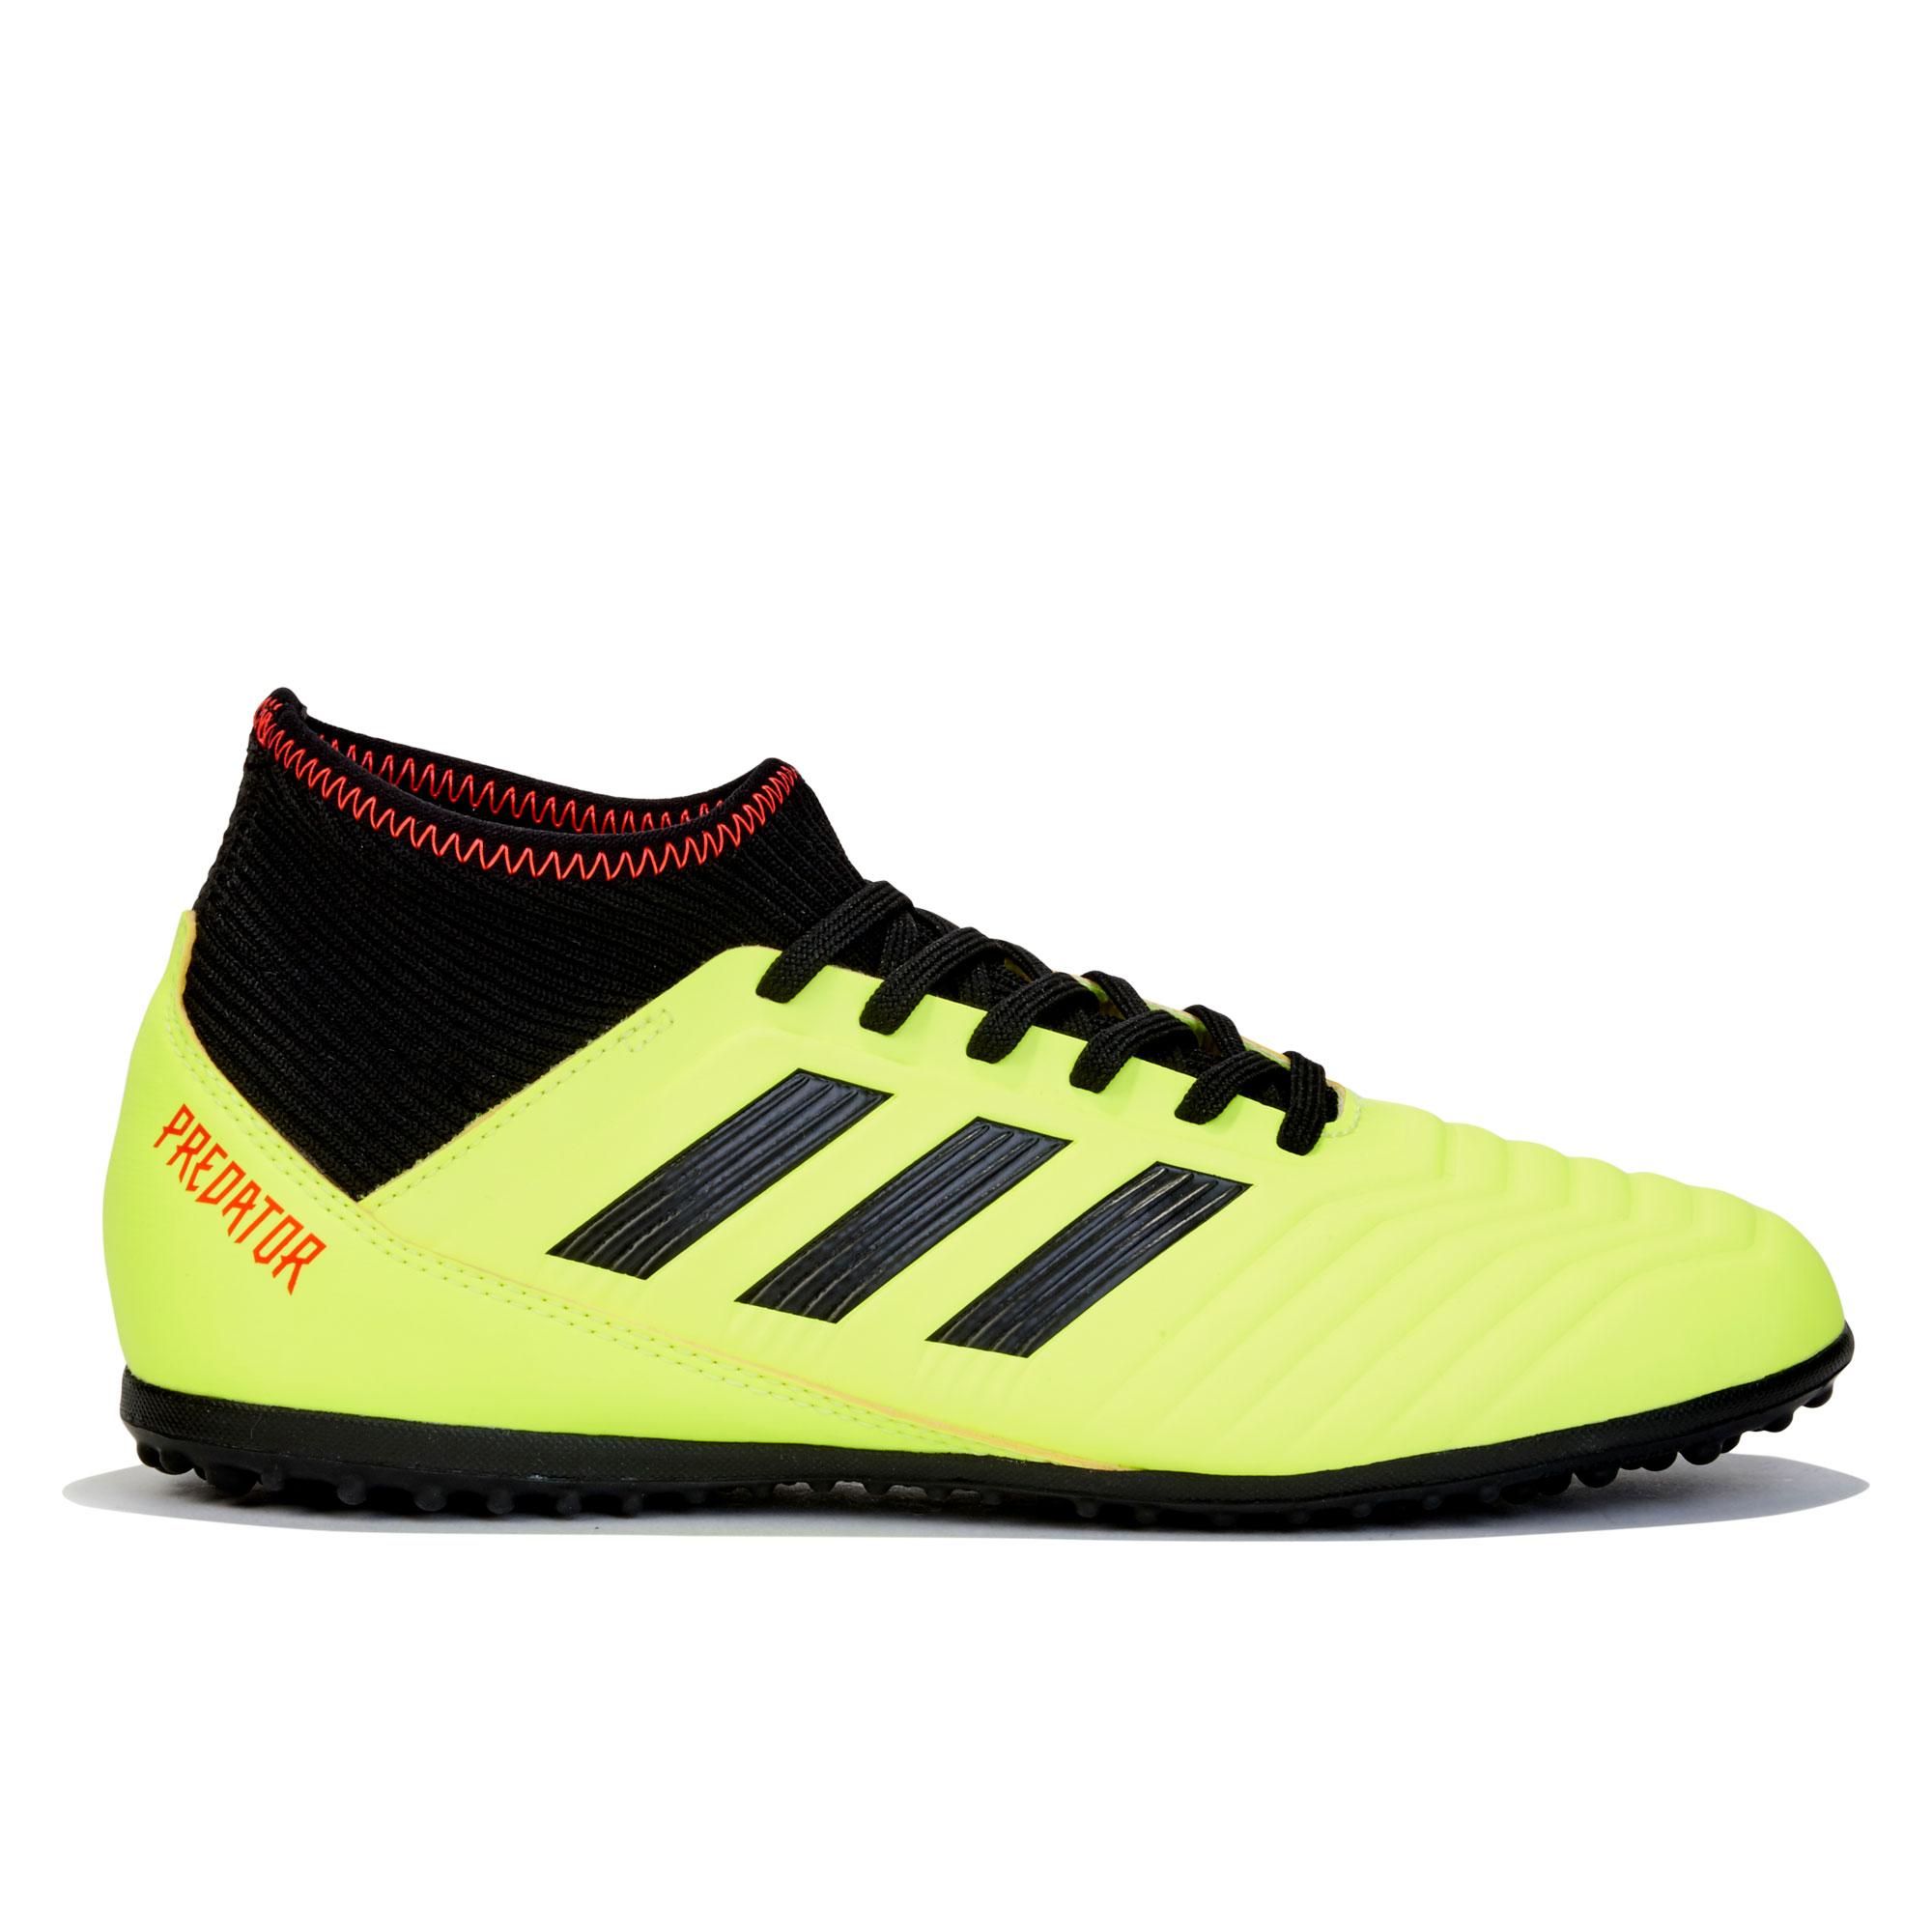 Image of adidas Predator Tango 18.3 Astroturf Trainers - Yellow - Kids